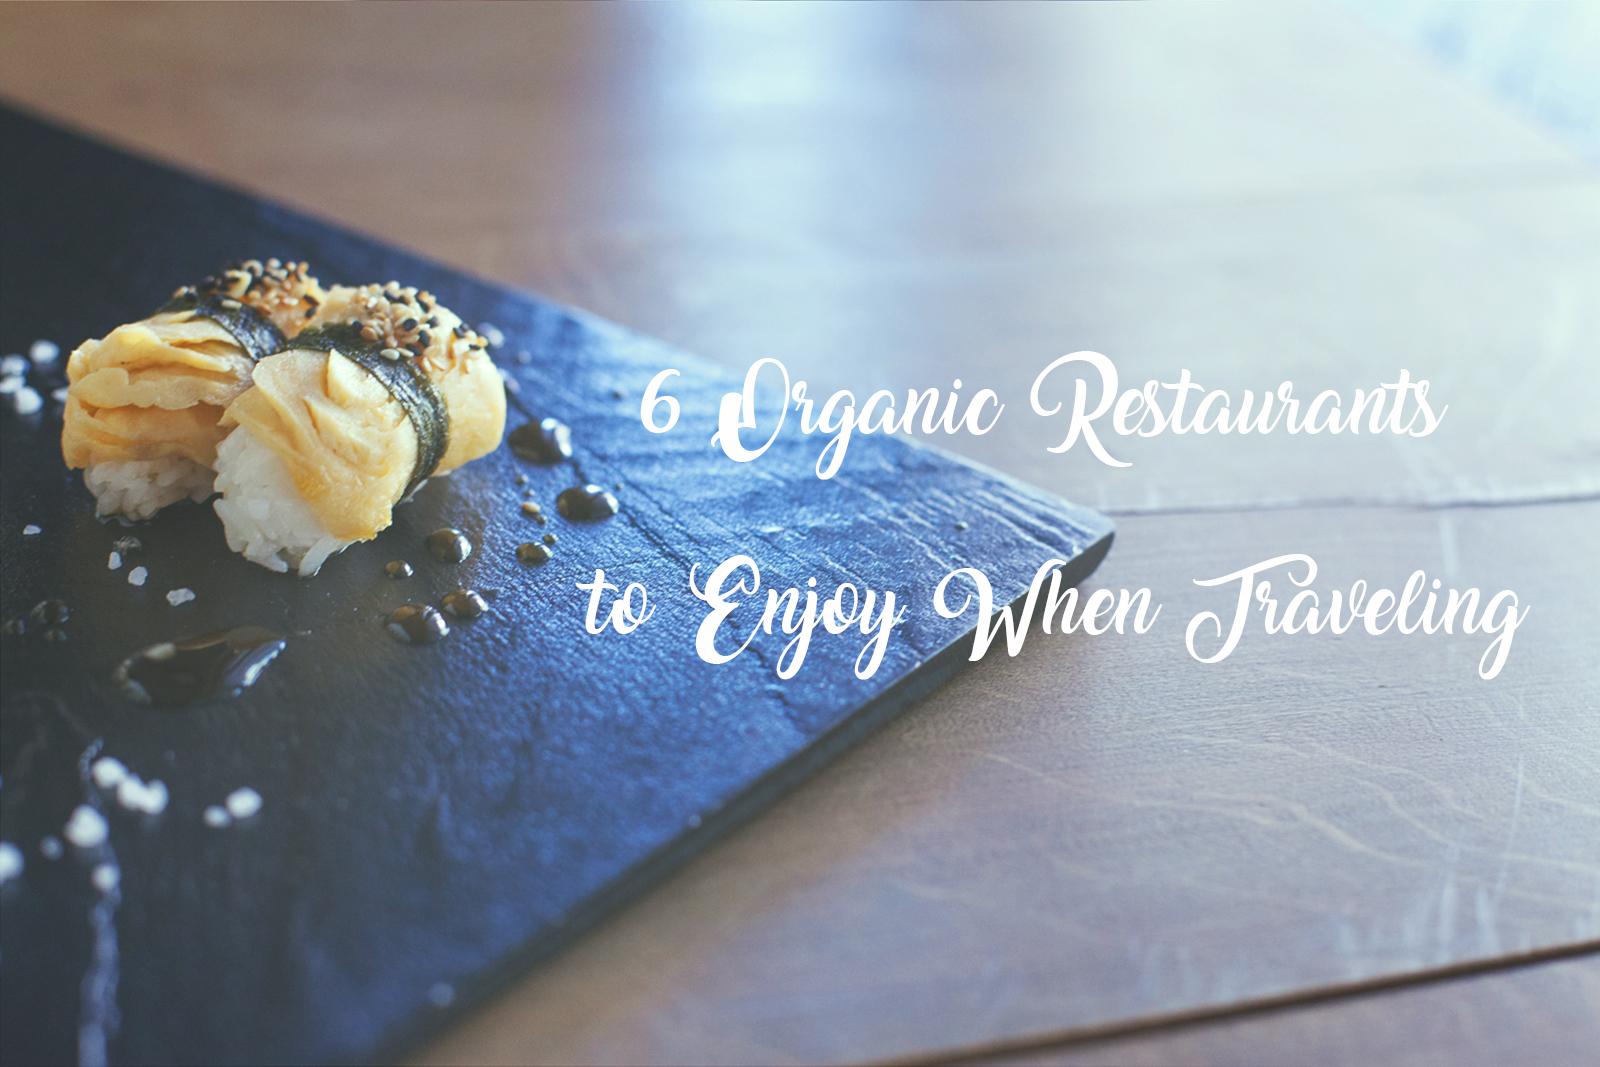 Organic restaurants to enjoy when traveling